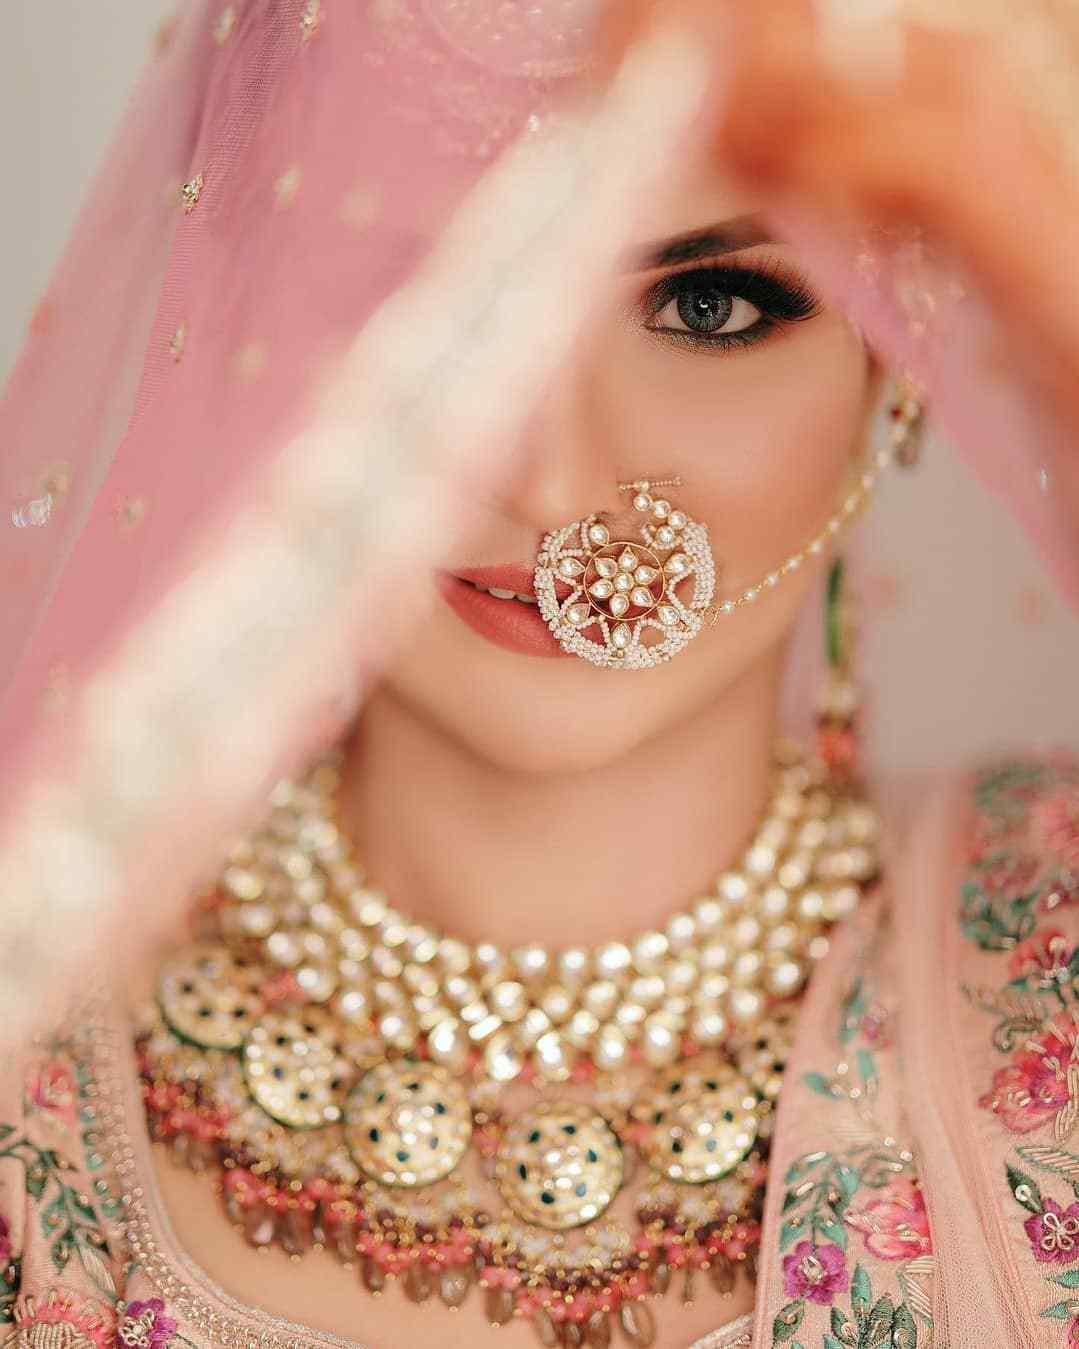 Bridal Jewellery | Bridal Jewelry | Bridal Nath | Bridal Naath | Bridal eye makeup